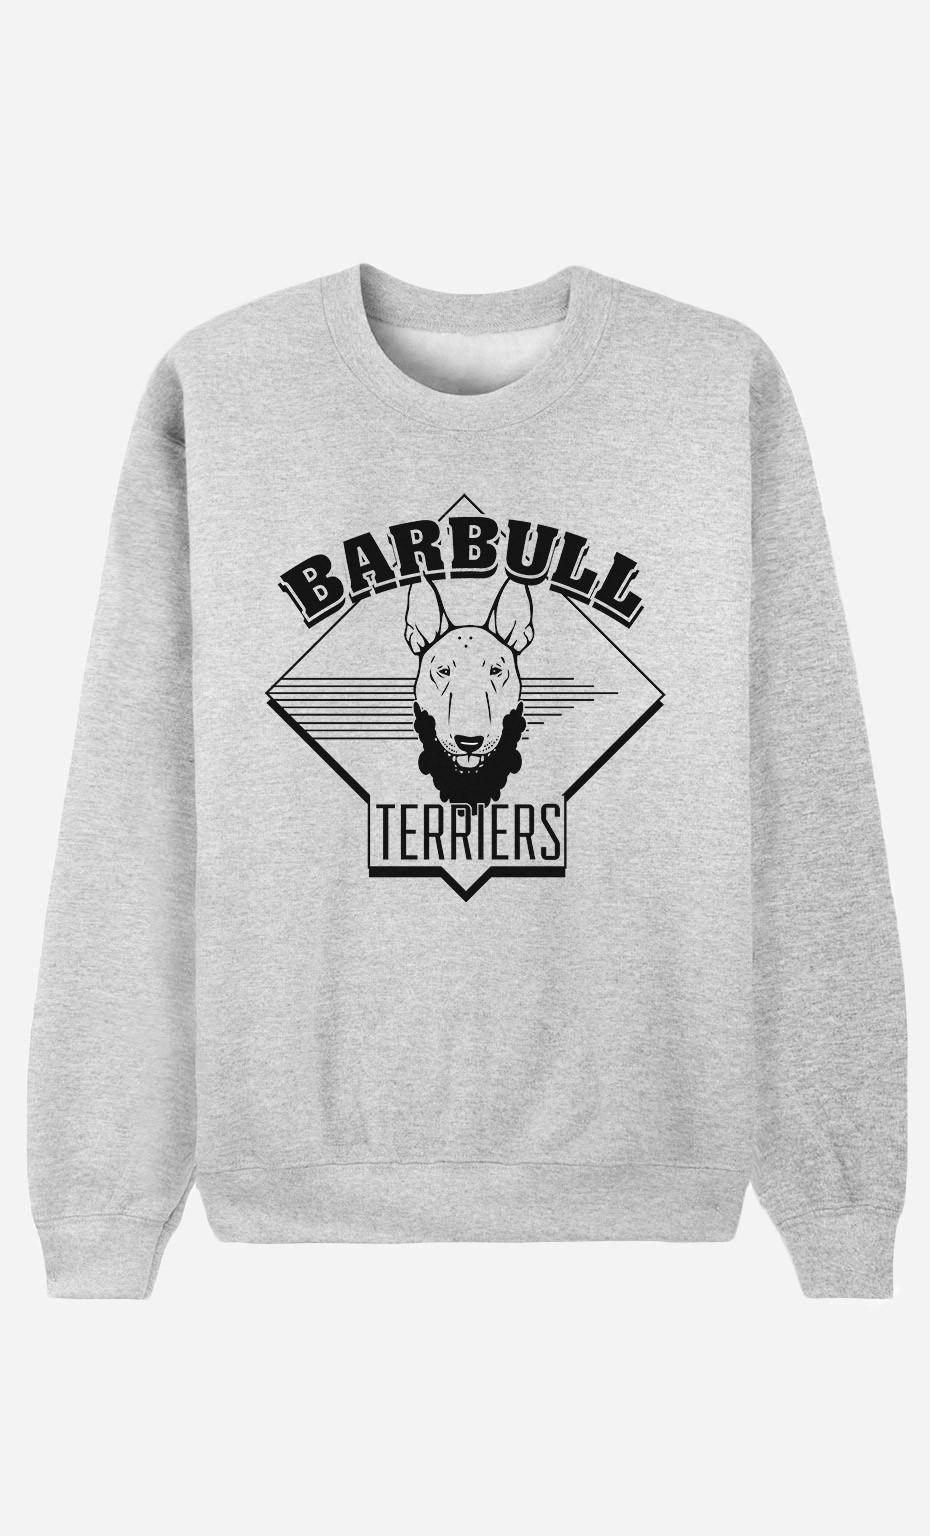 Sweat Femme Barbull'terriers